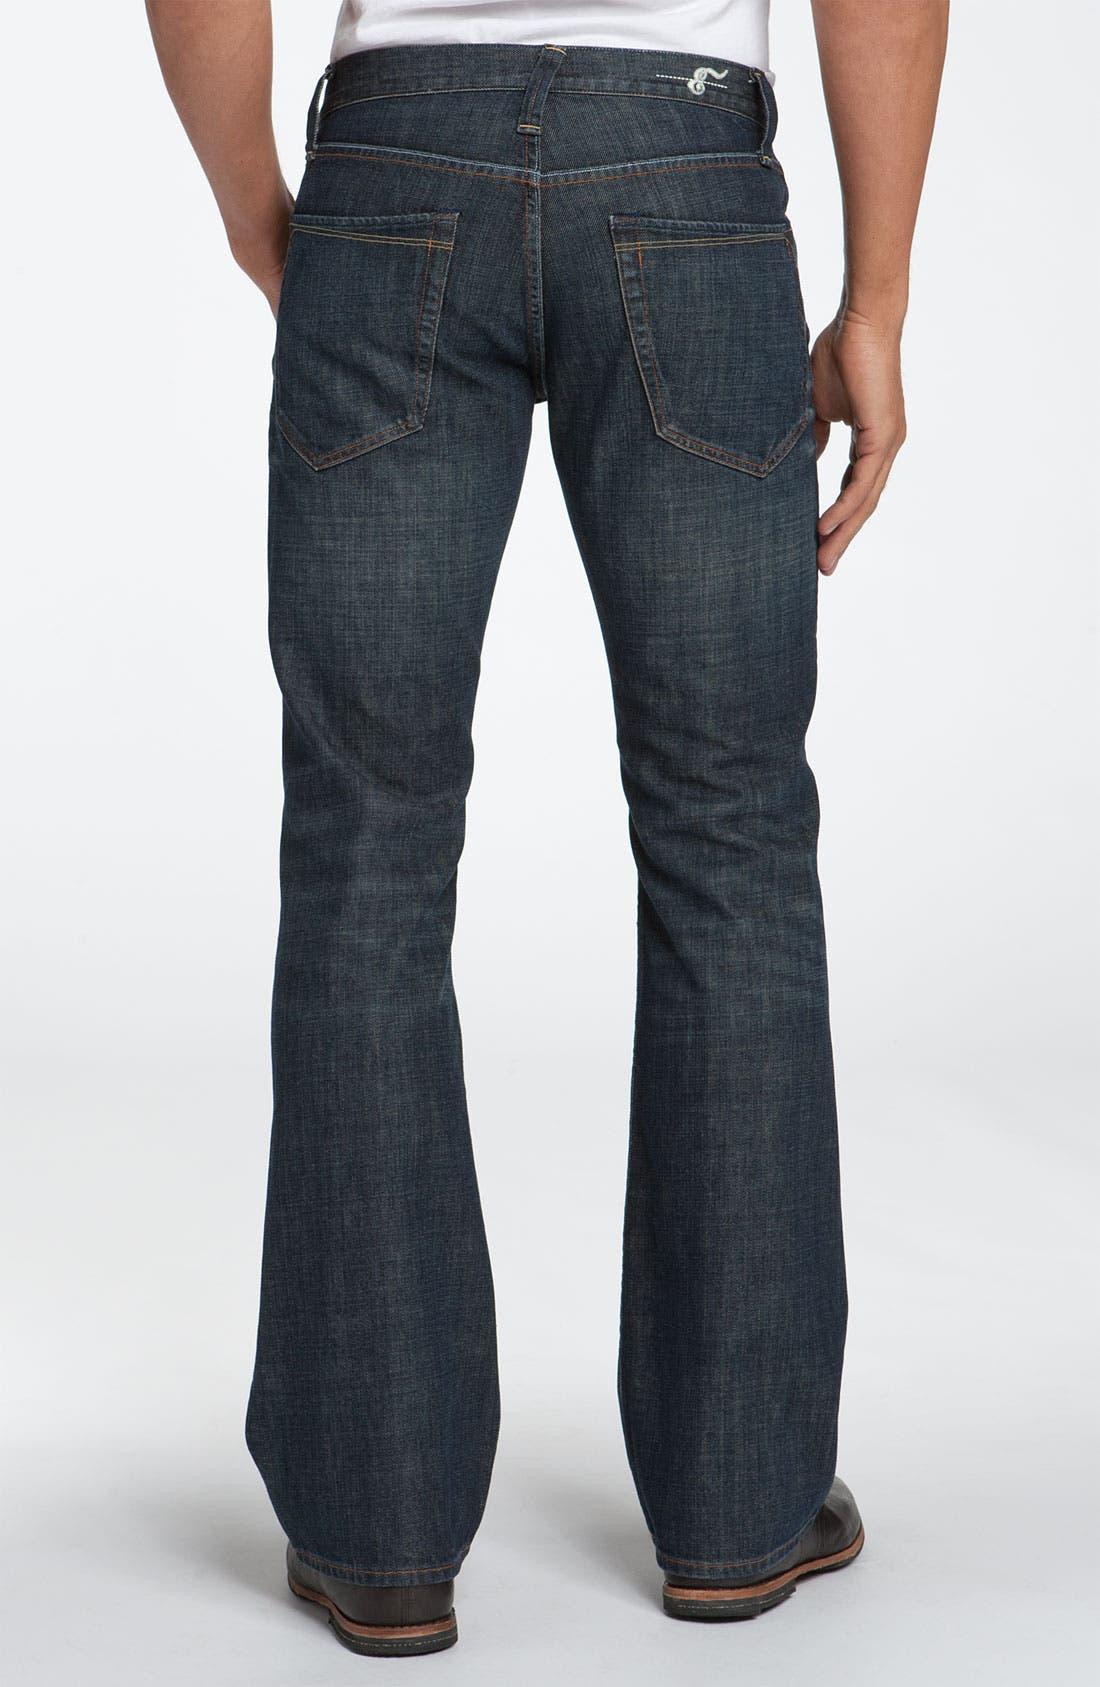 Alternate Image 1 Selected - Earnest Sewn 'Hutch' Bootcut Jeans (Maz Dark)